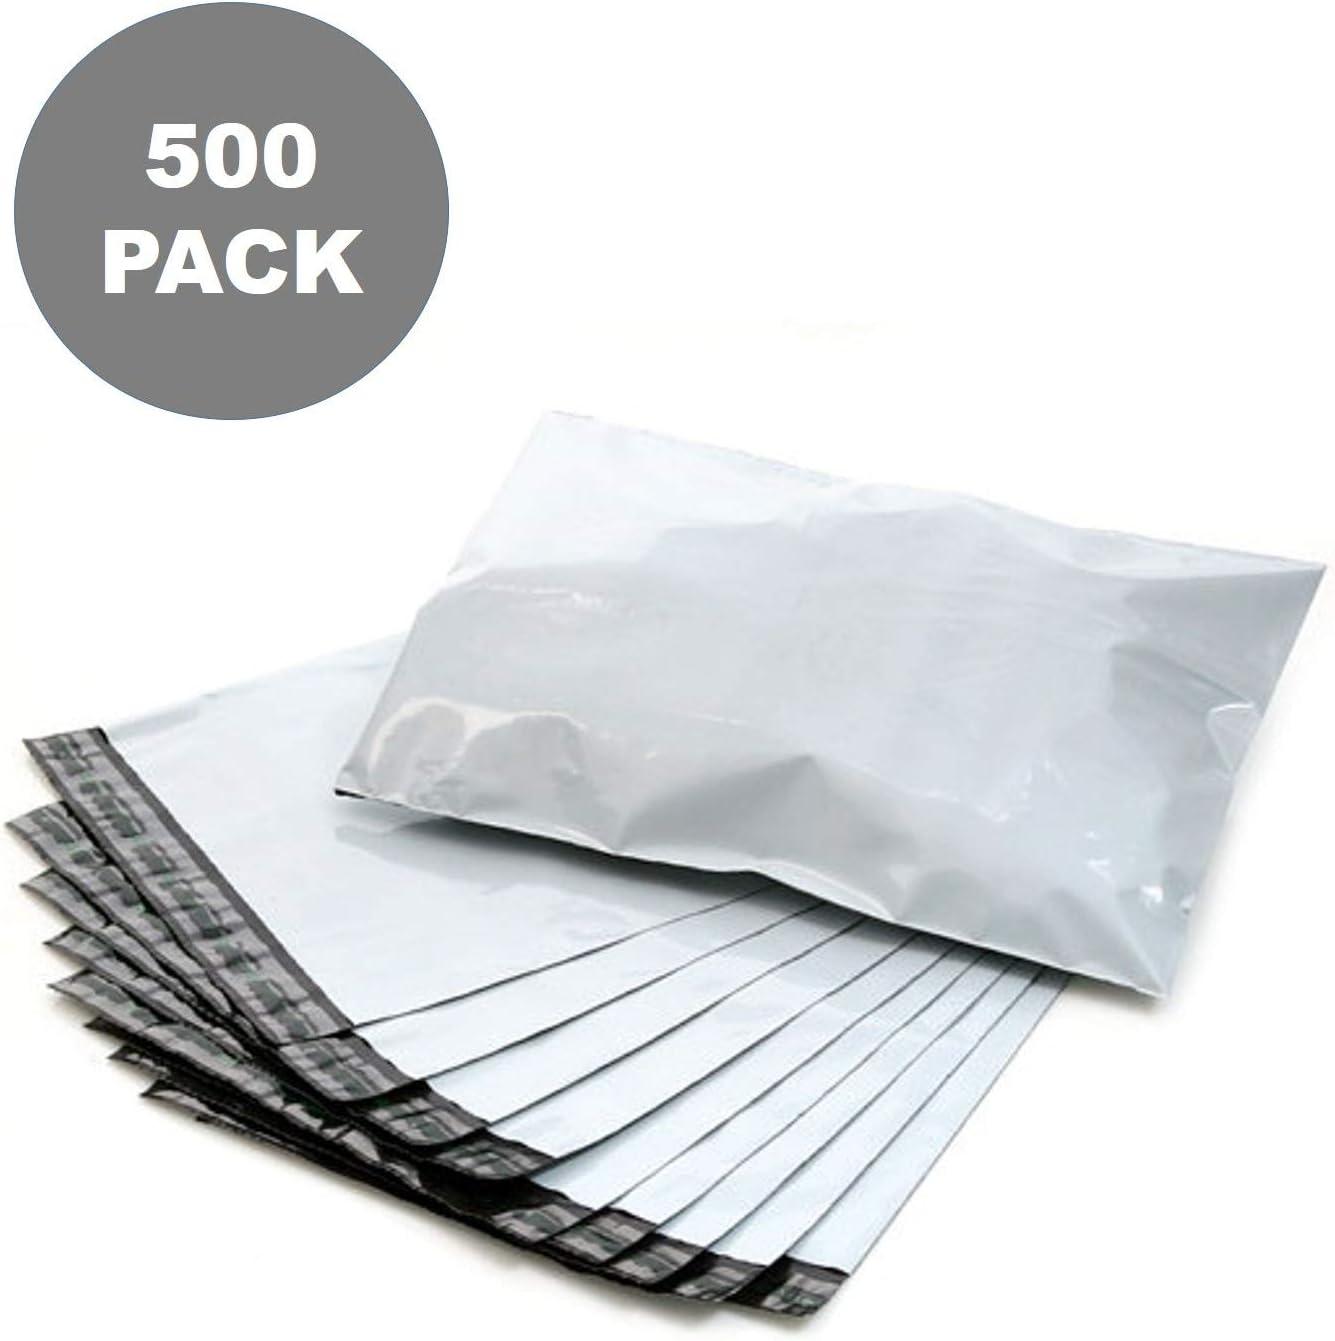 500 12x15.5 TUFF Poly Mailers 12 x 15.5 White Self Sealing Bags Envelopes